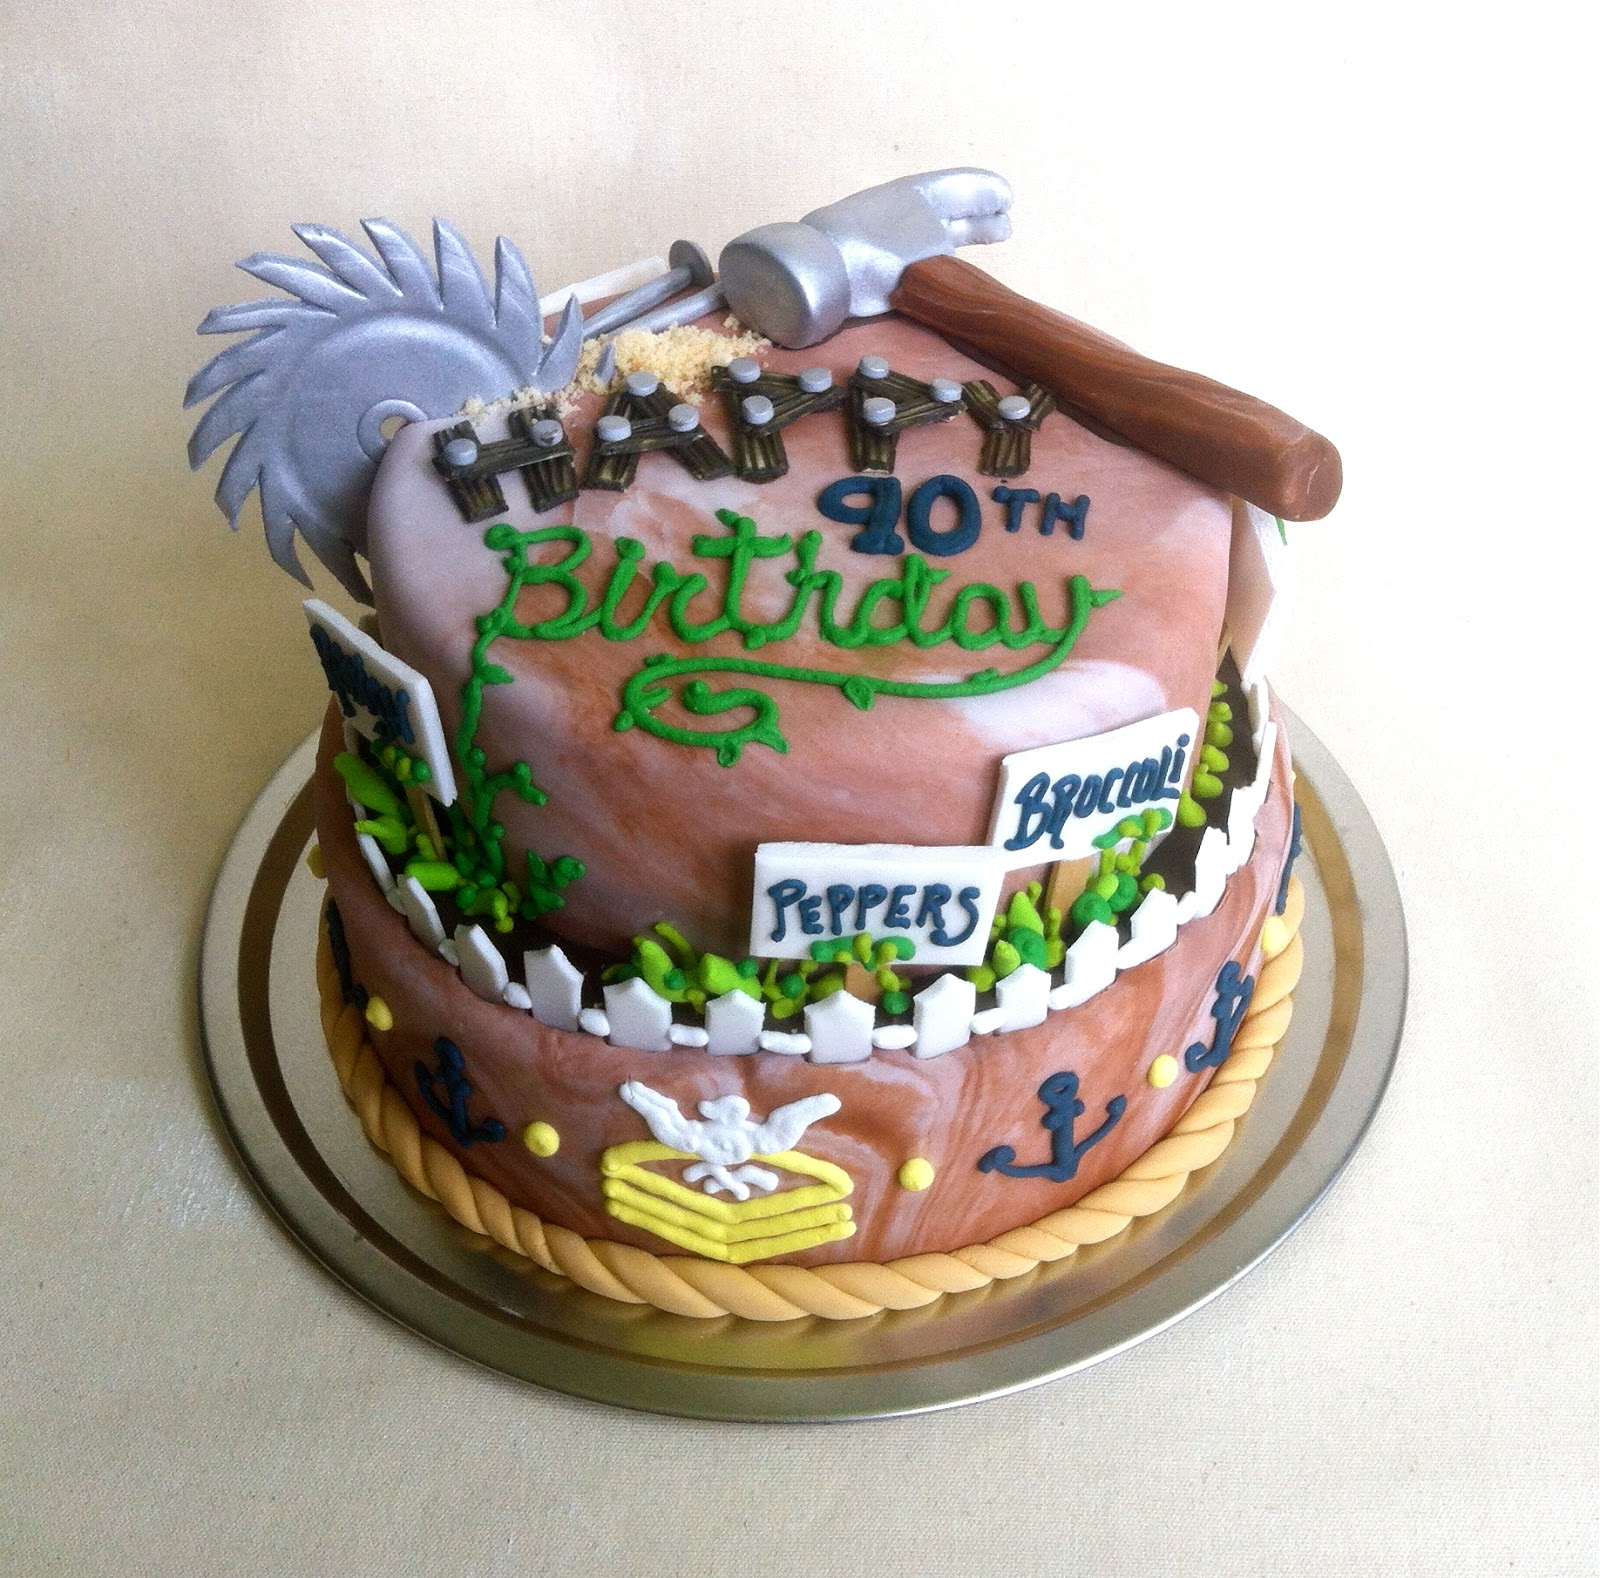 Birthday Cake Ideas For 90 Year Old Man Ry Pfaff Cakes June 2013